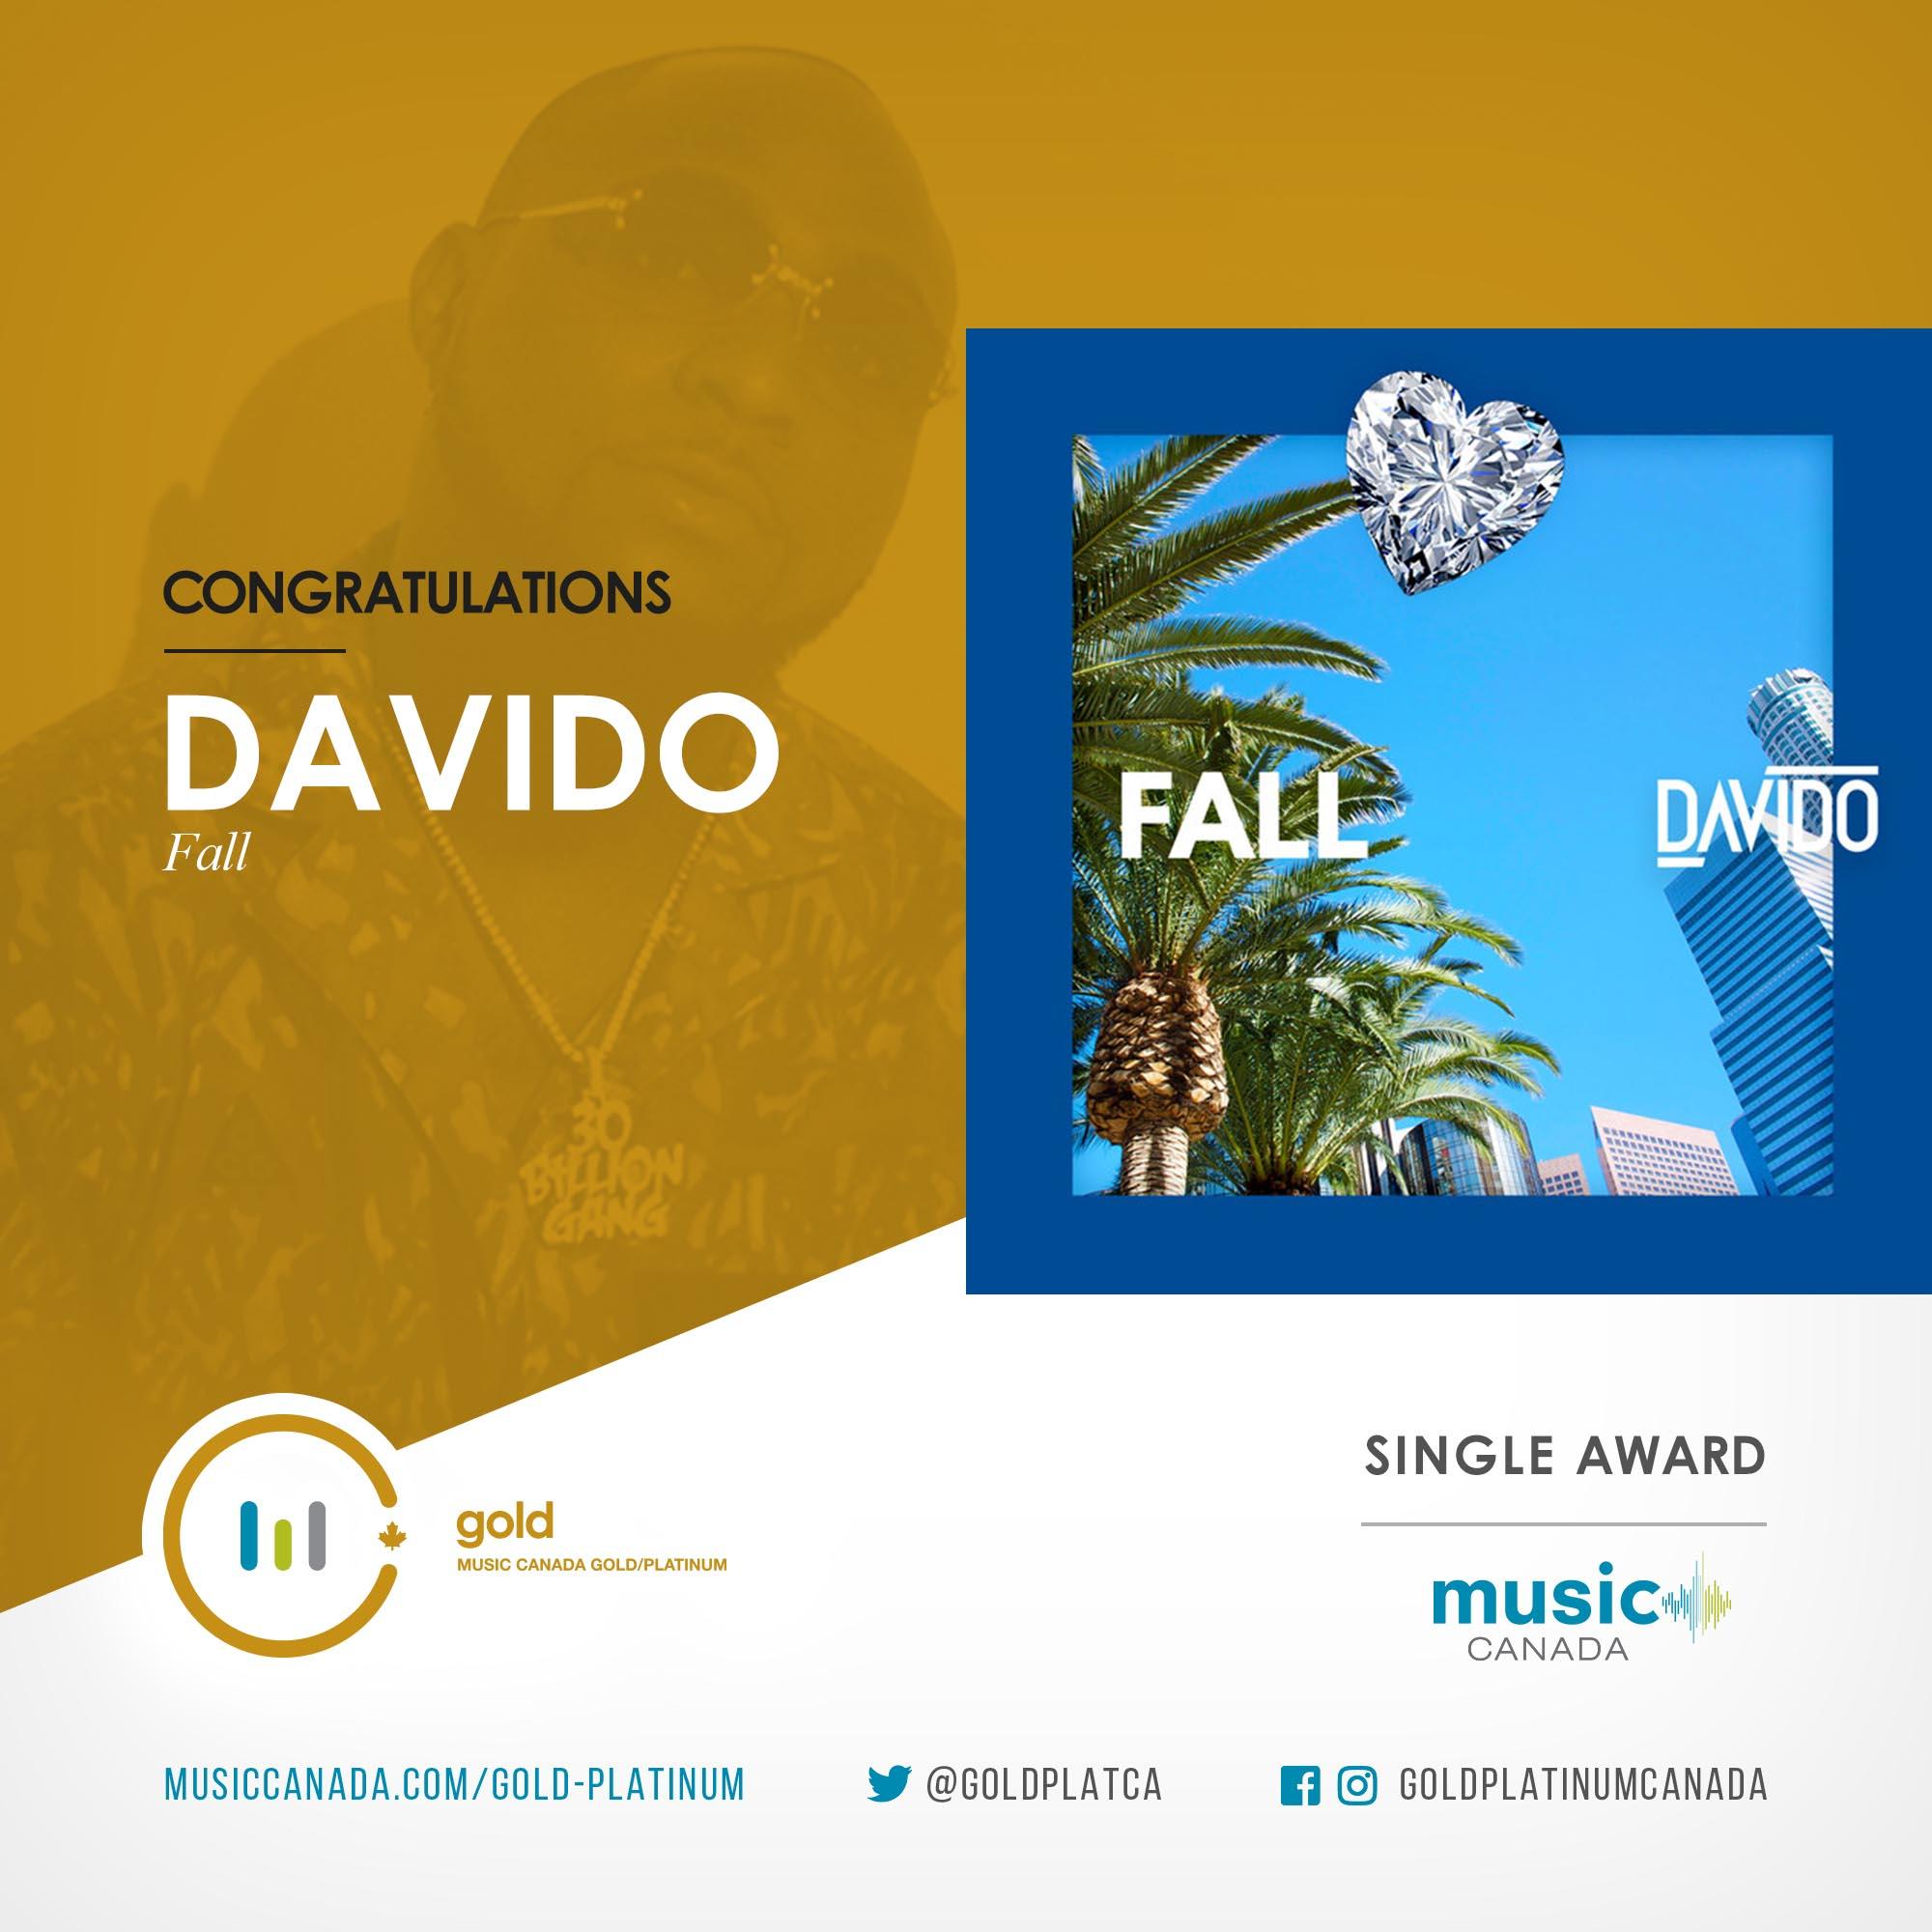 davido-fall-certified-gold-lyrics-video-style-news-2020-songs-age-net-worth